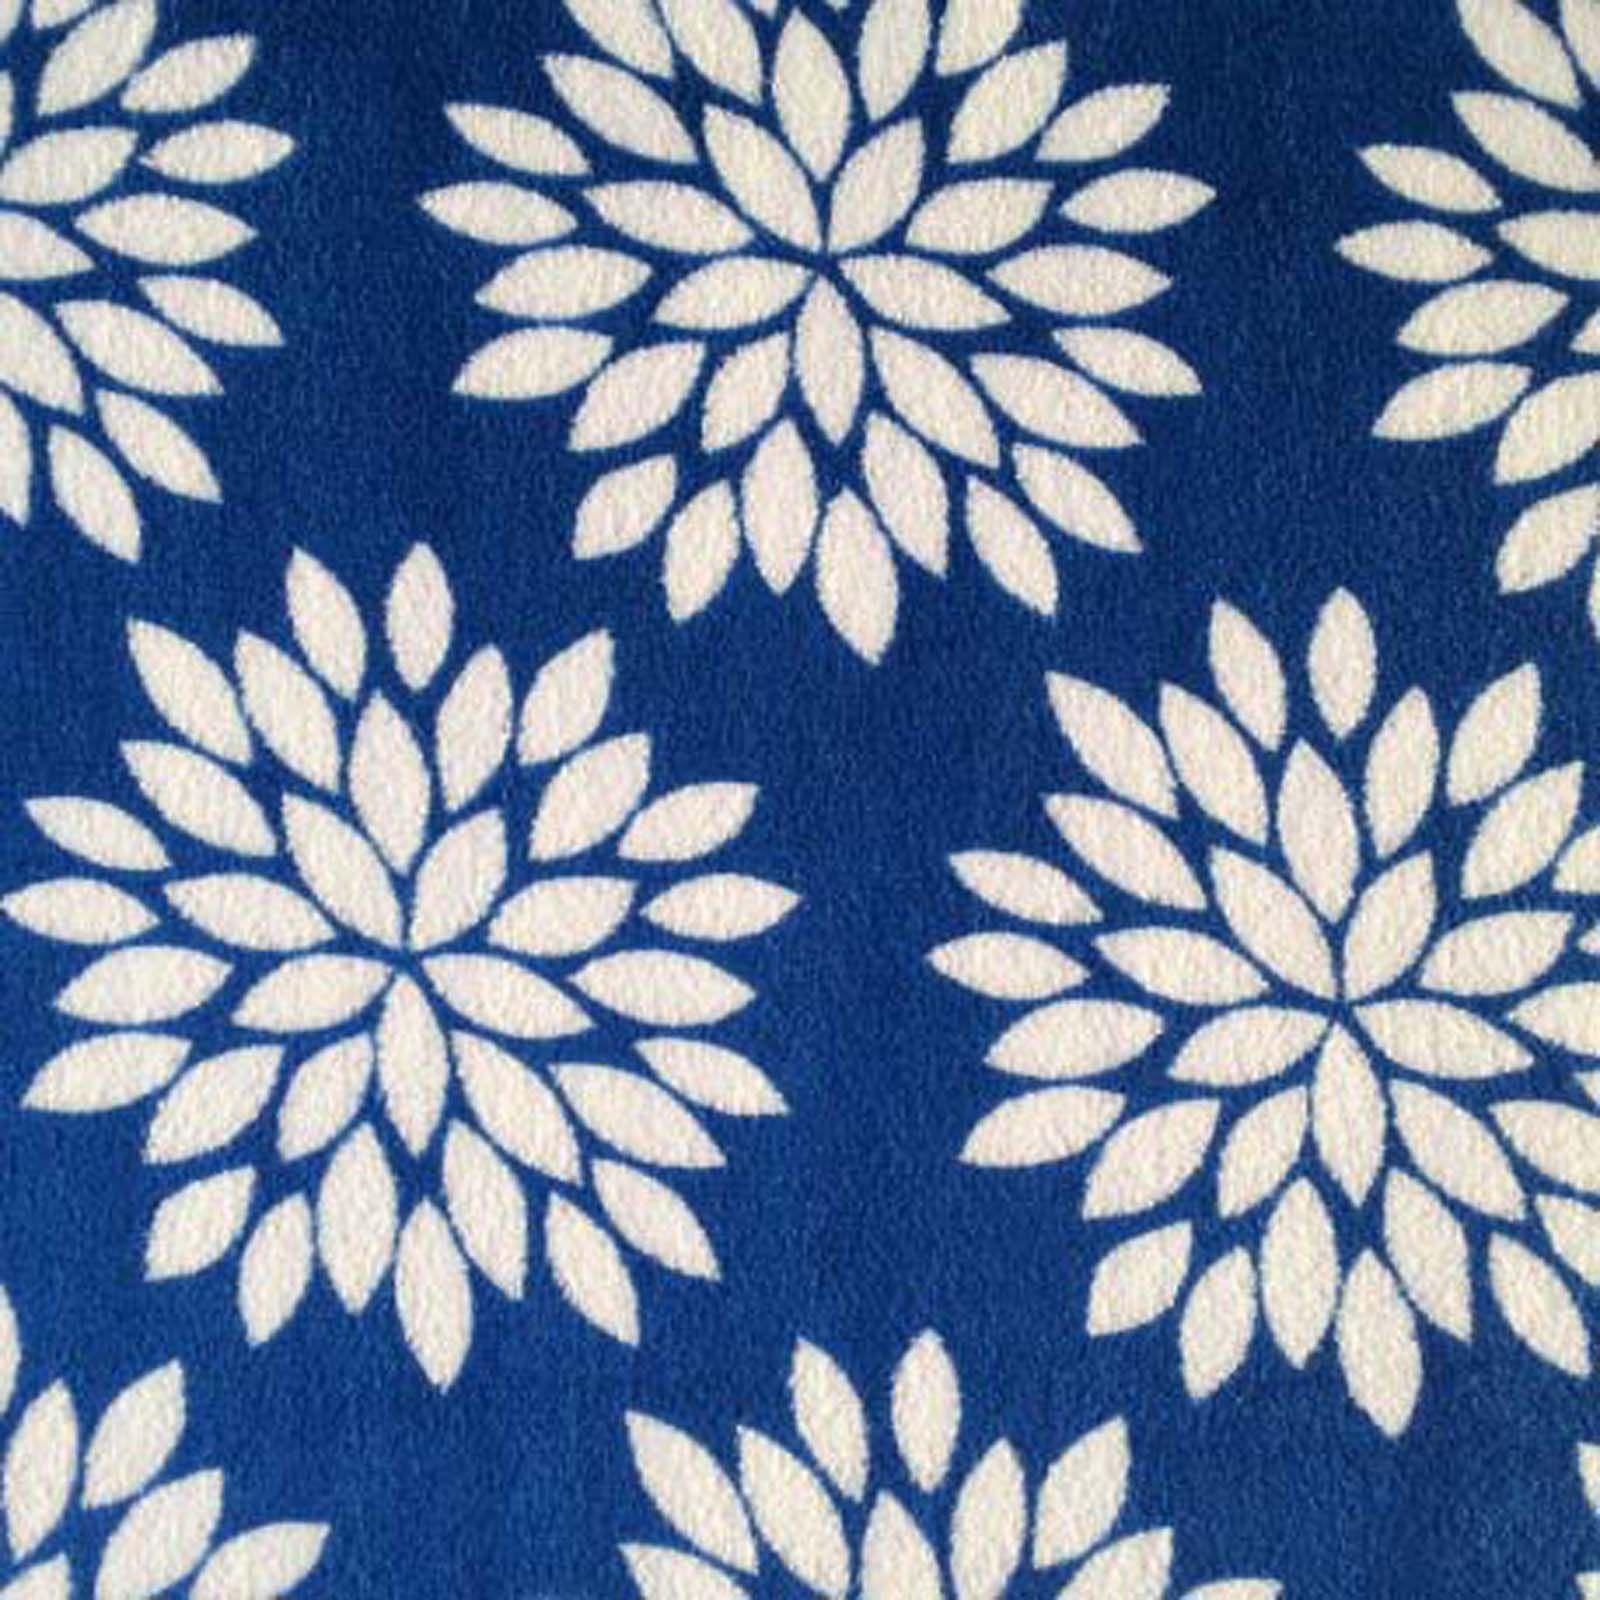 Ultra cuddle fabric mums blueultra cuddle fabric mums blue